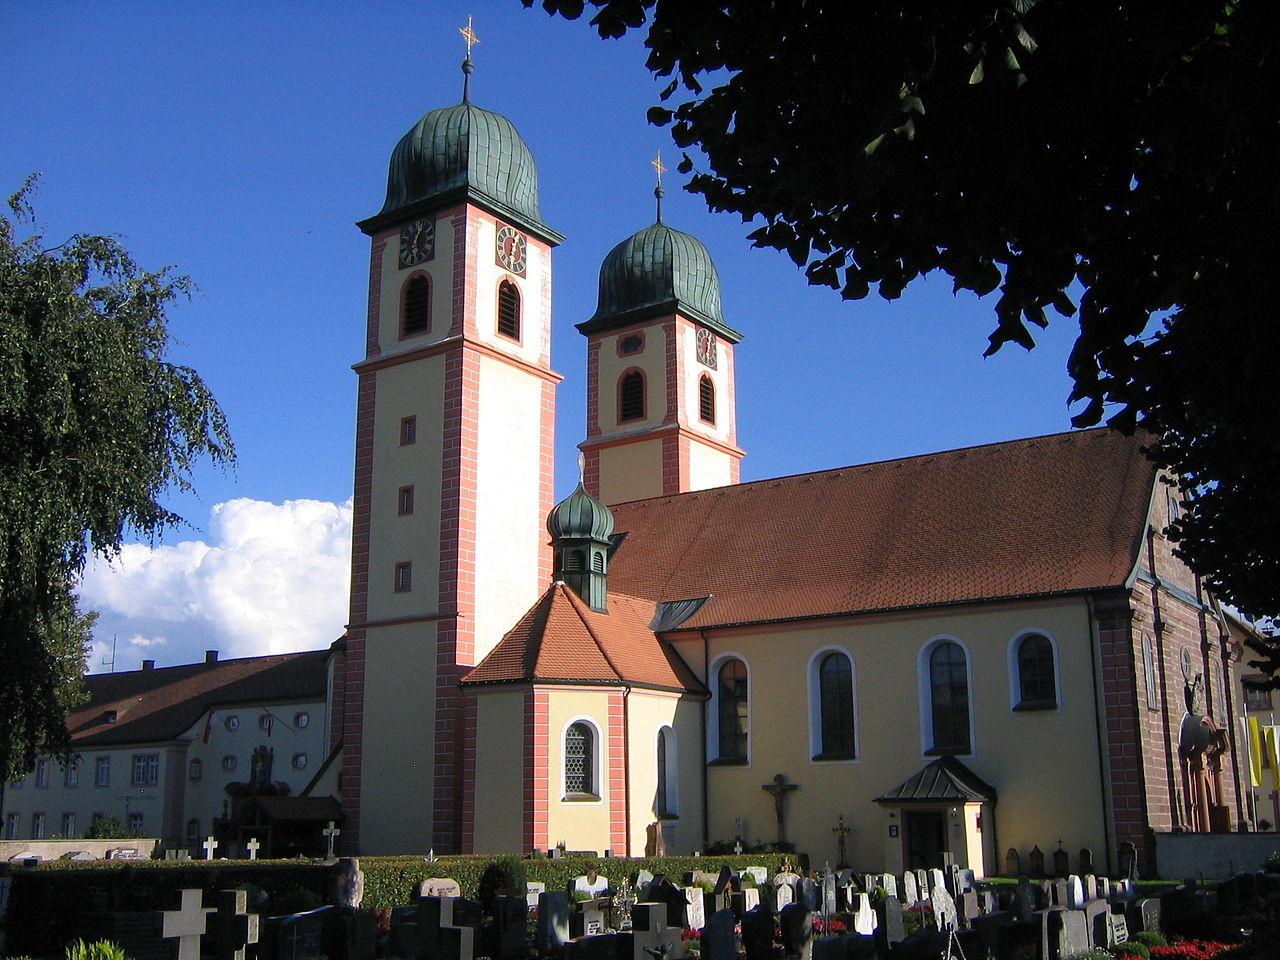 Bild Kloster St. Märgen